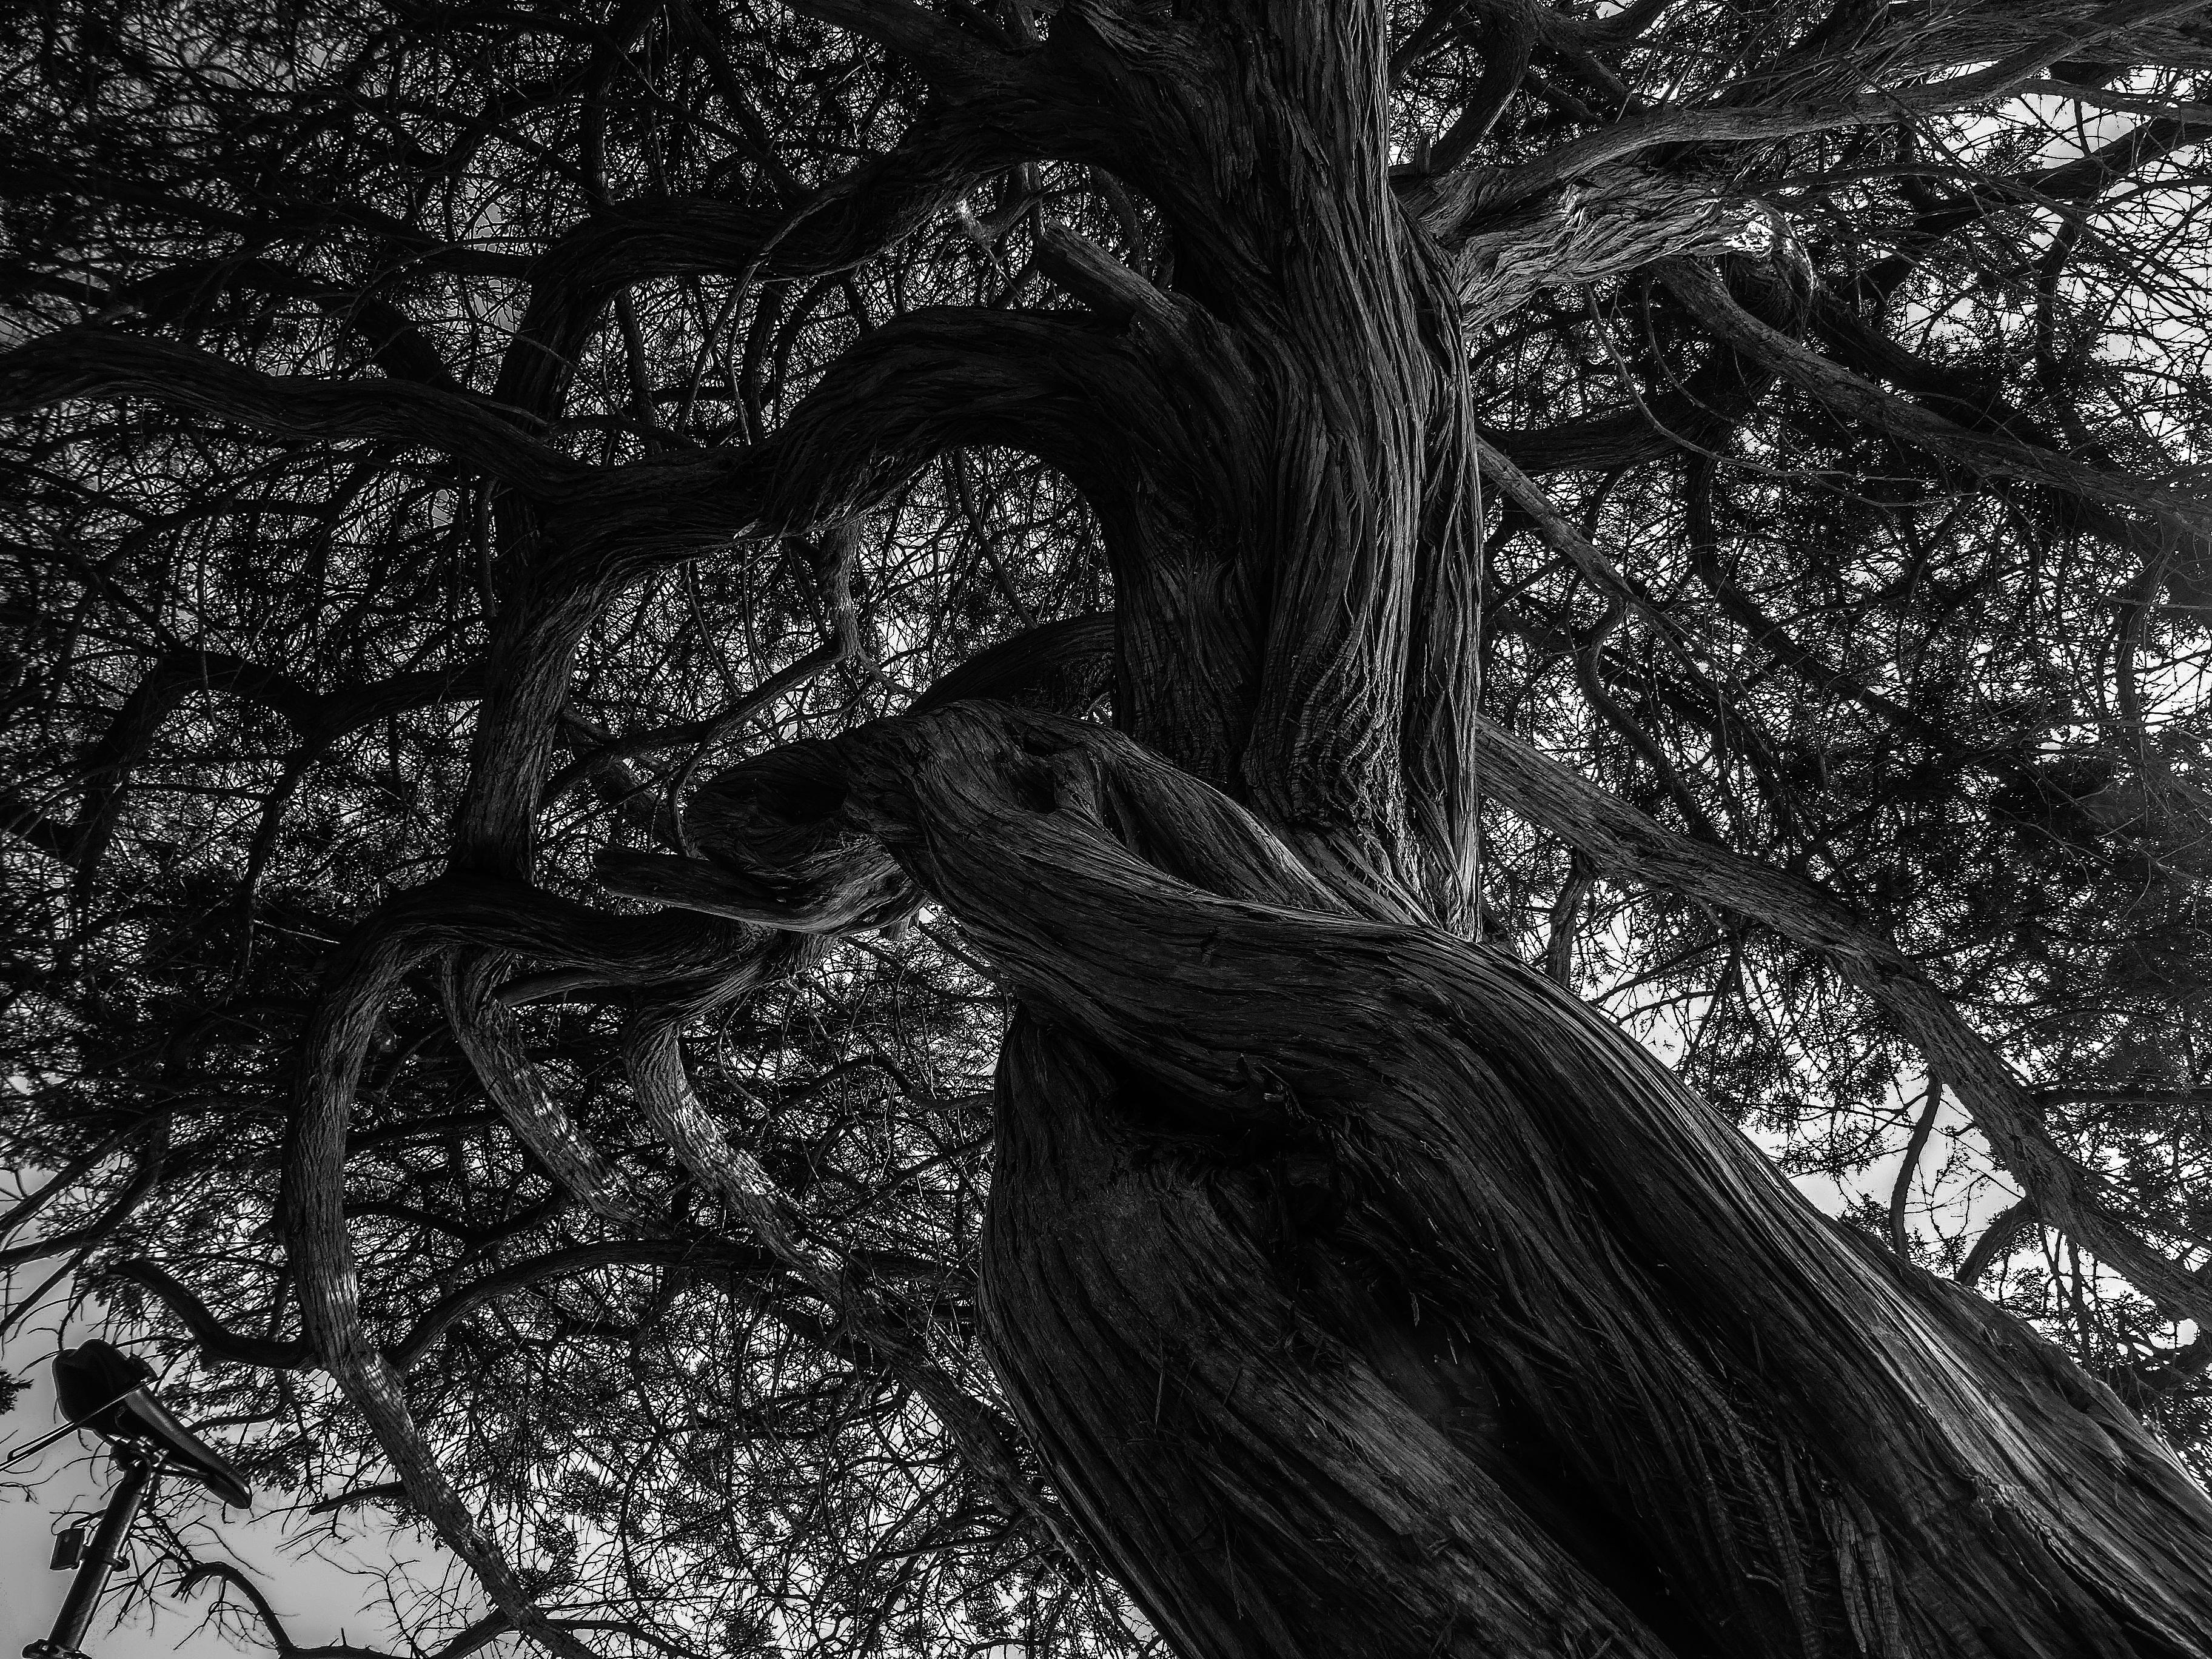 Фото дерево черно белое